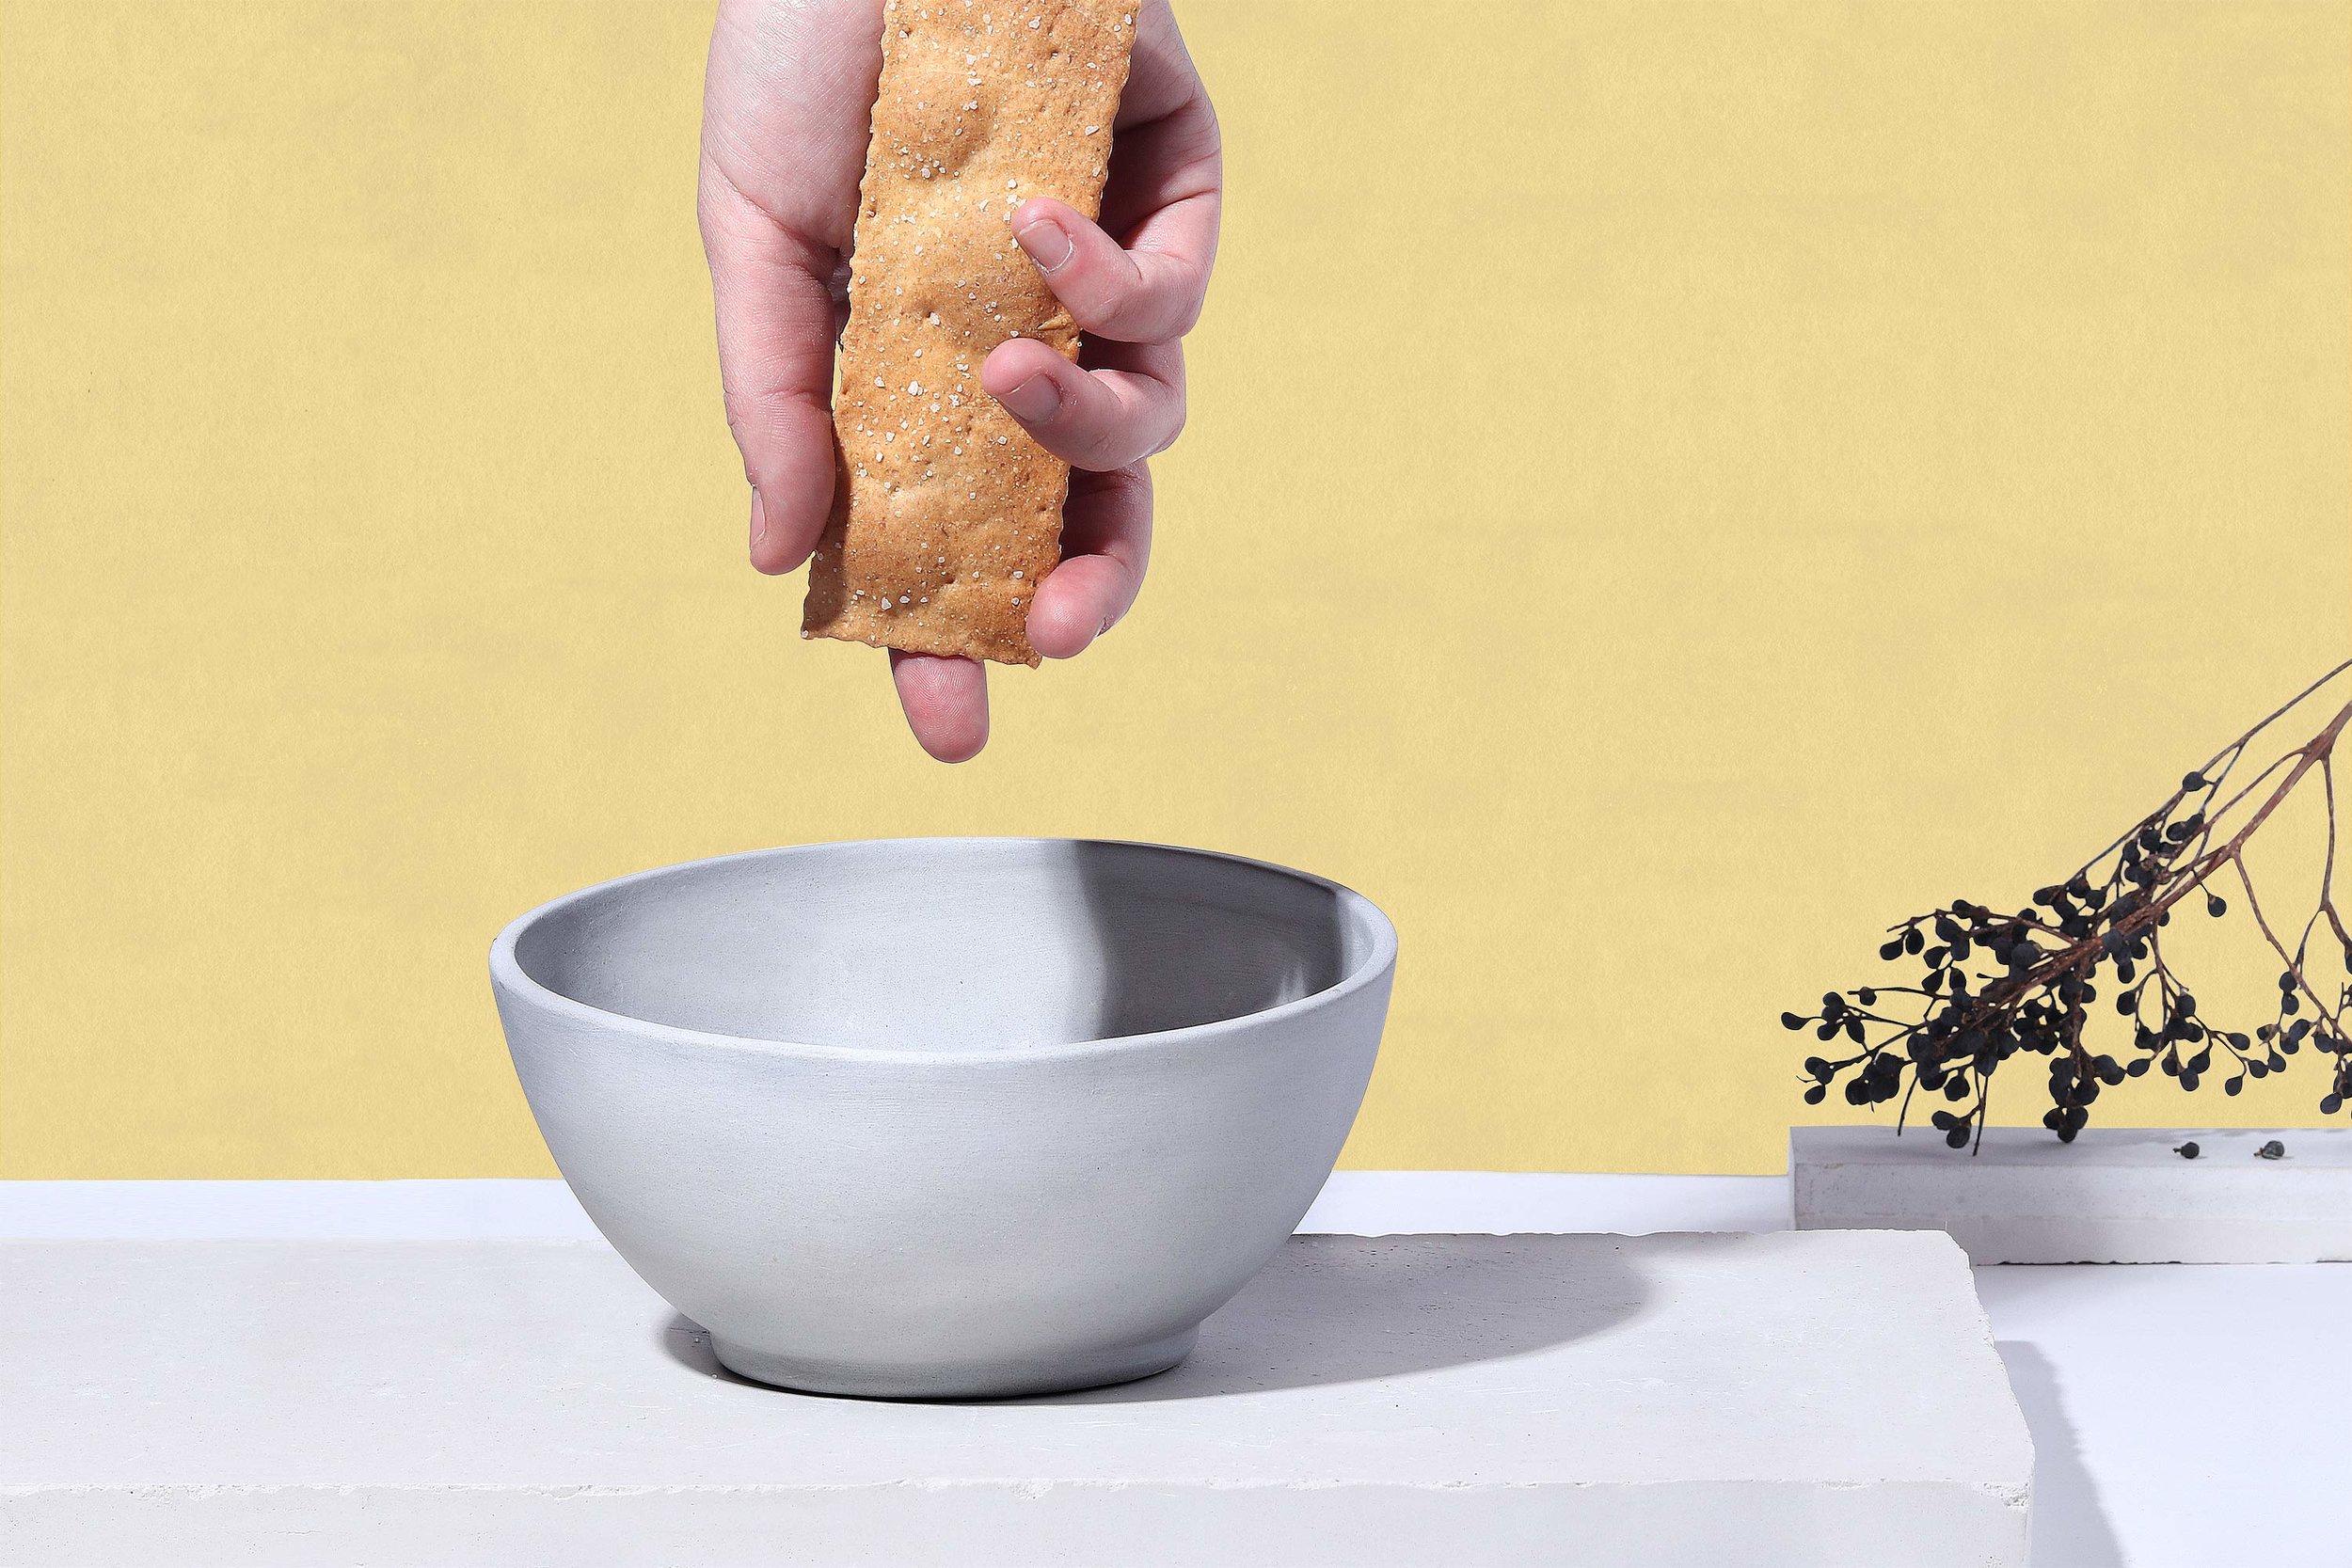 TORO PINTO - Breana´s Toast3.jpg